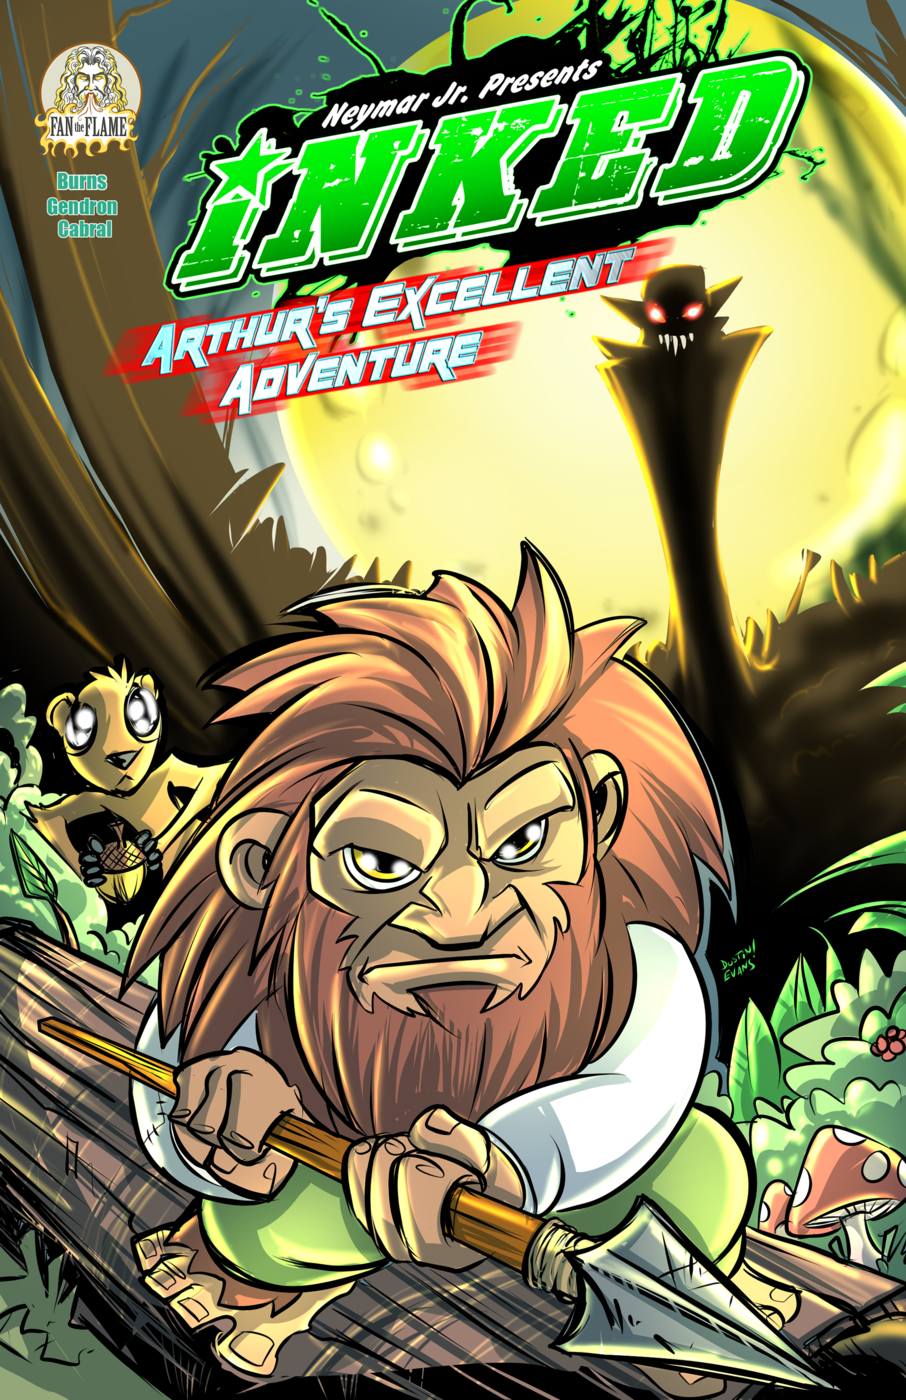 Inked: Arthur's Excellent Adventure #1.1